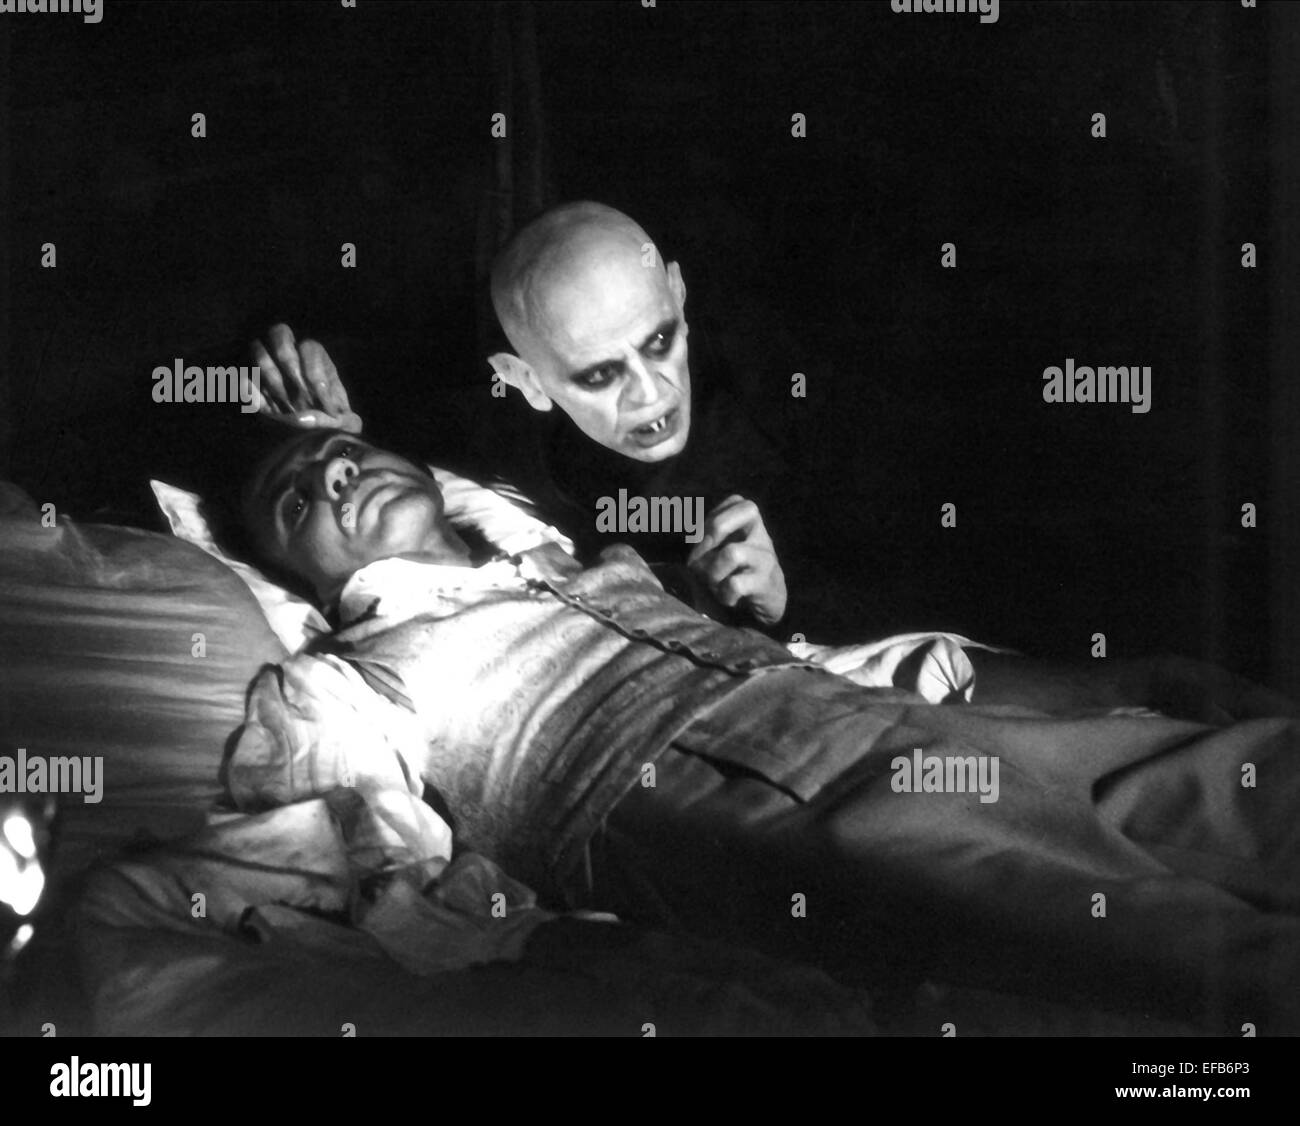 BRUNO GANZ & KLAUS KINSKI NOSFERATU THE VAMPYRE (1979) Stock Photo